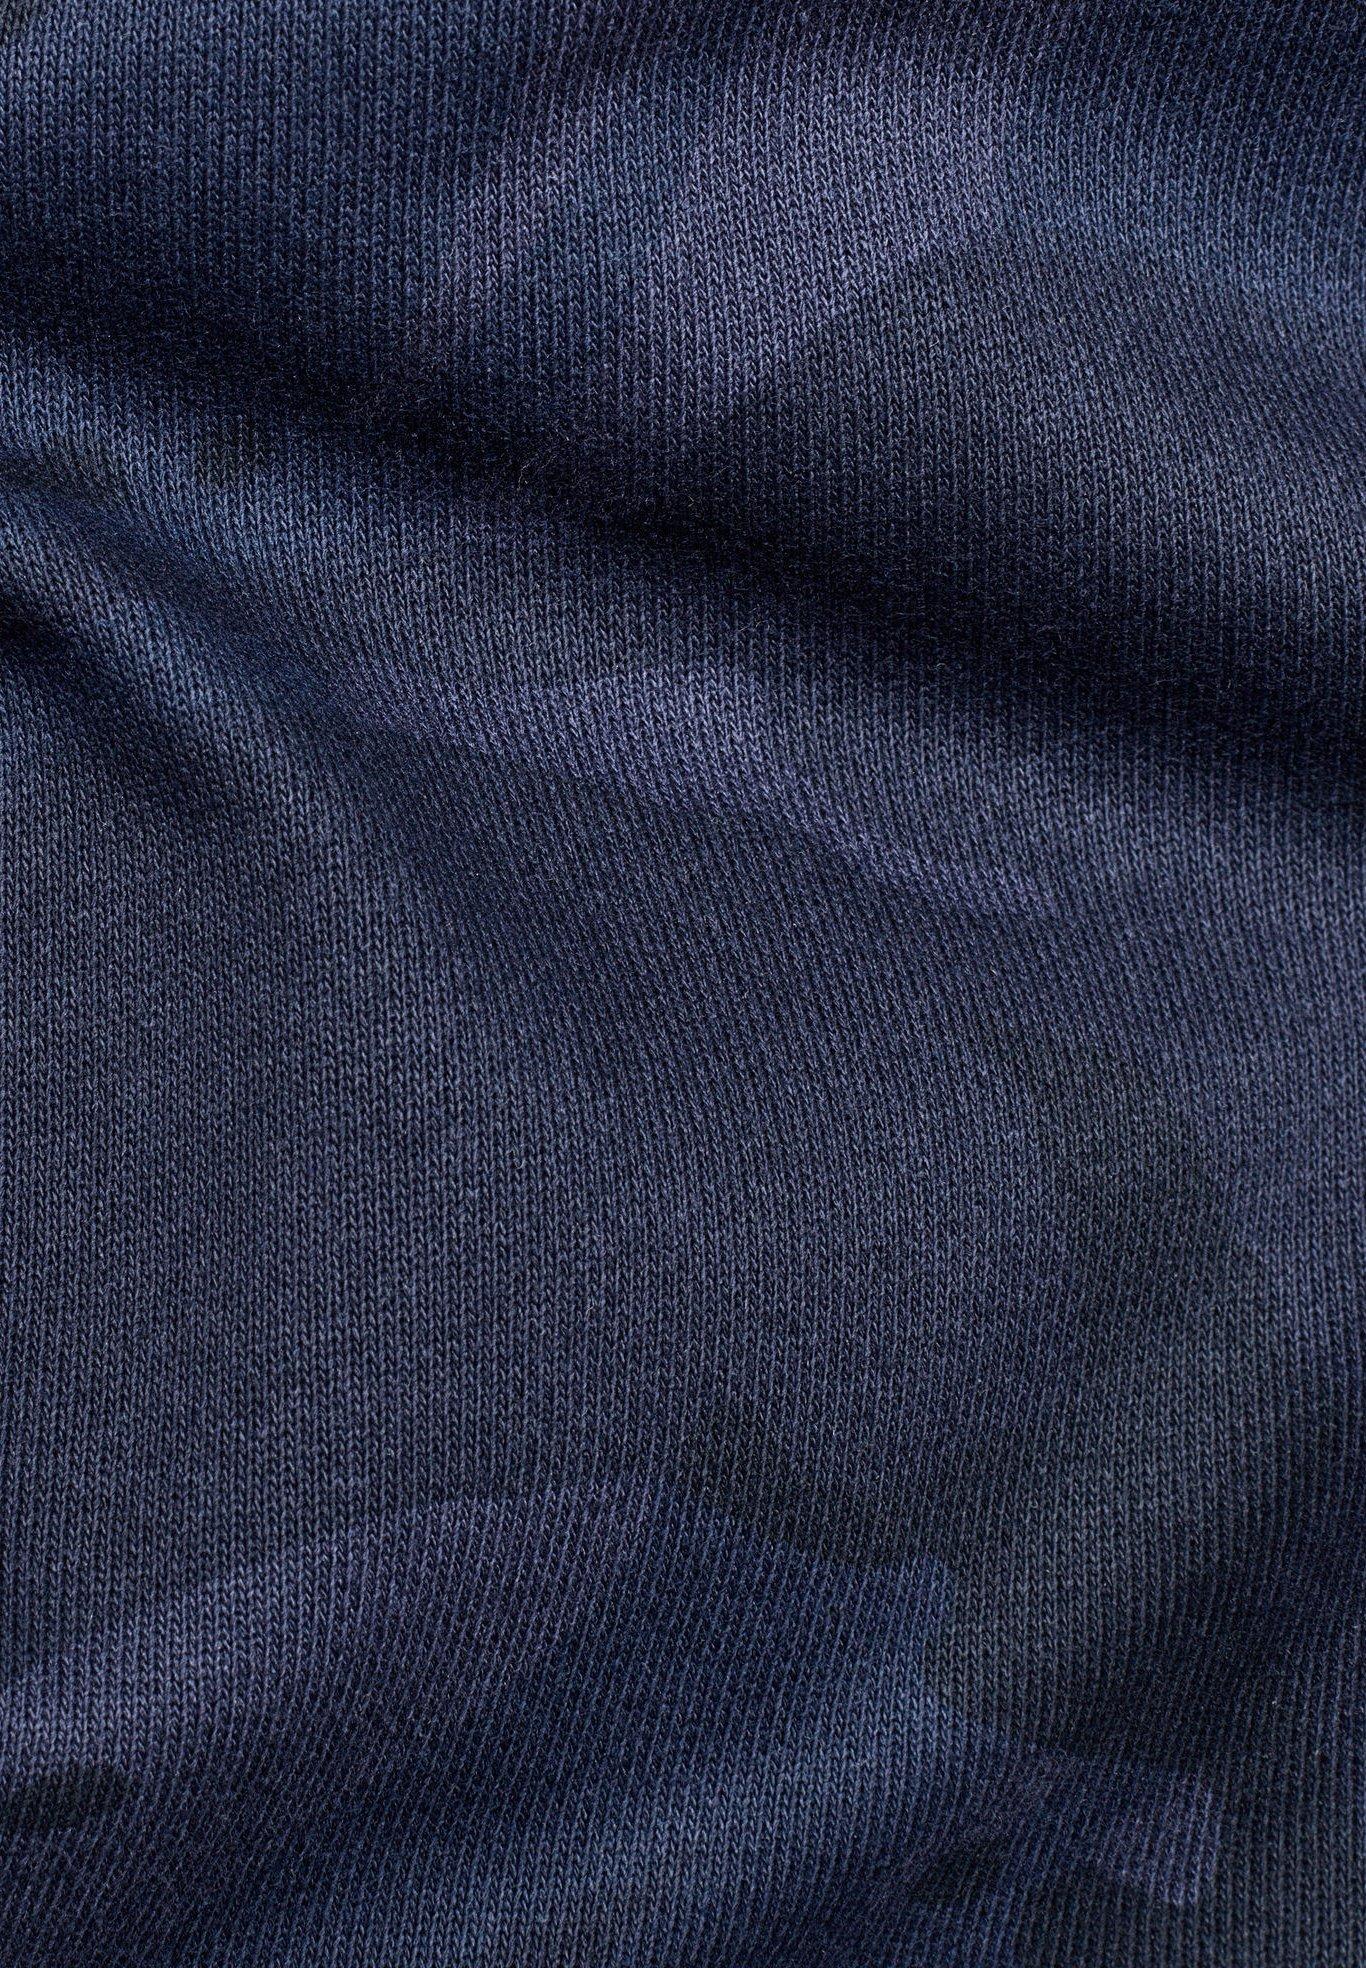 G-star Sweatshirt - Servant Blue